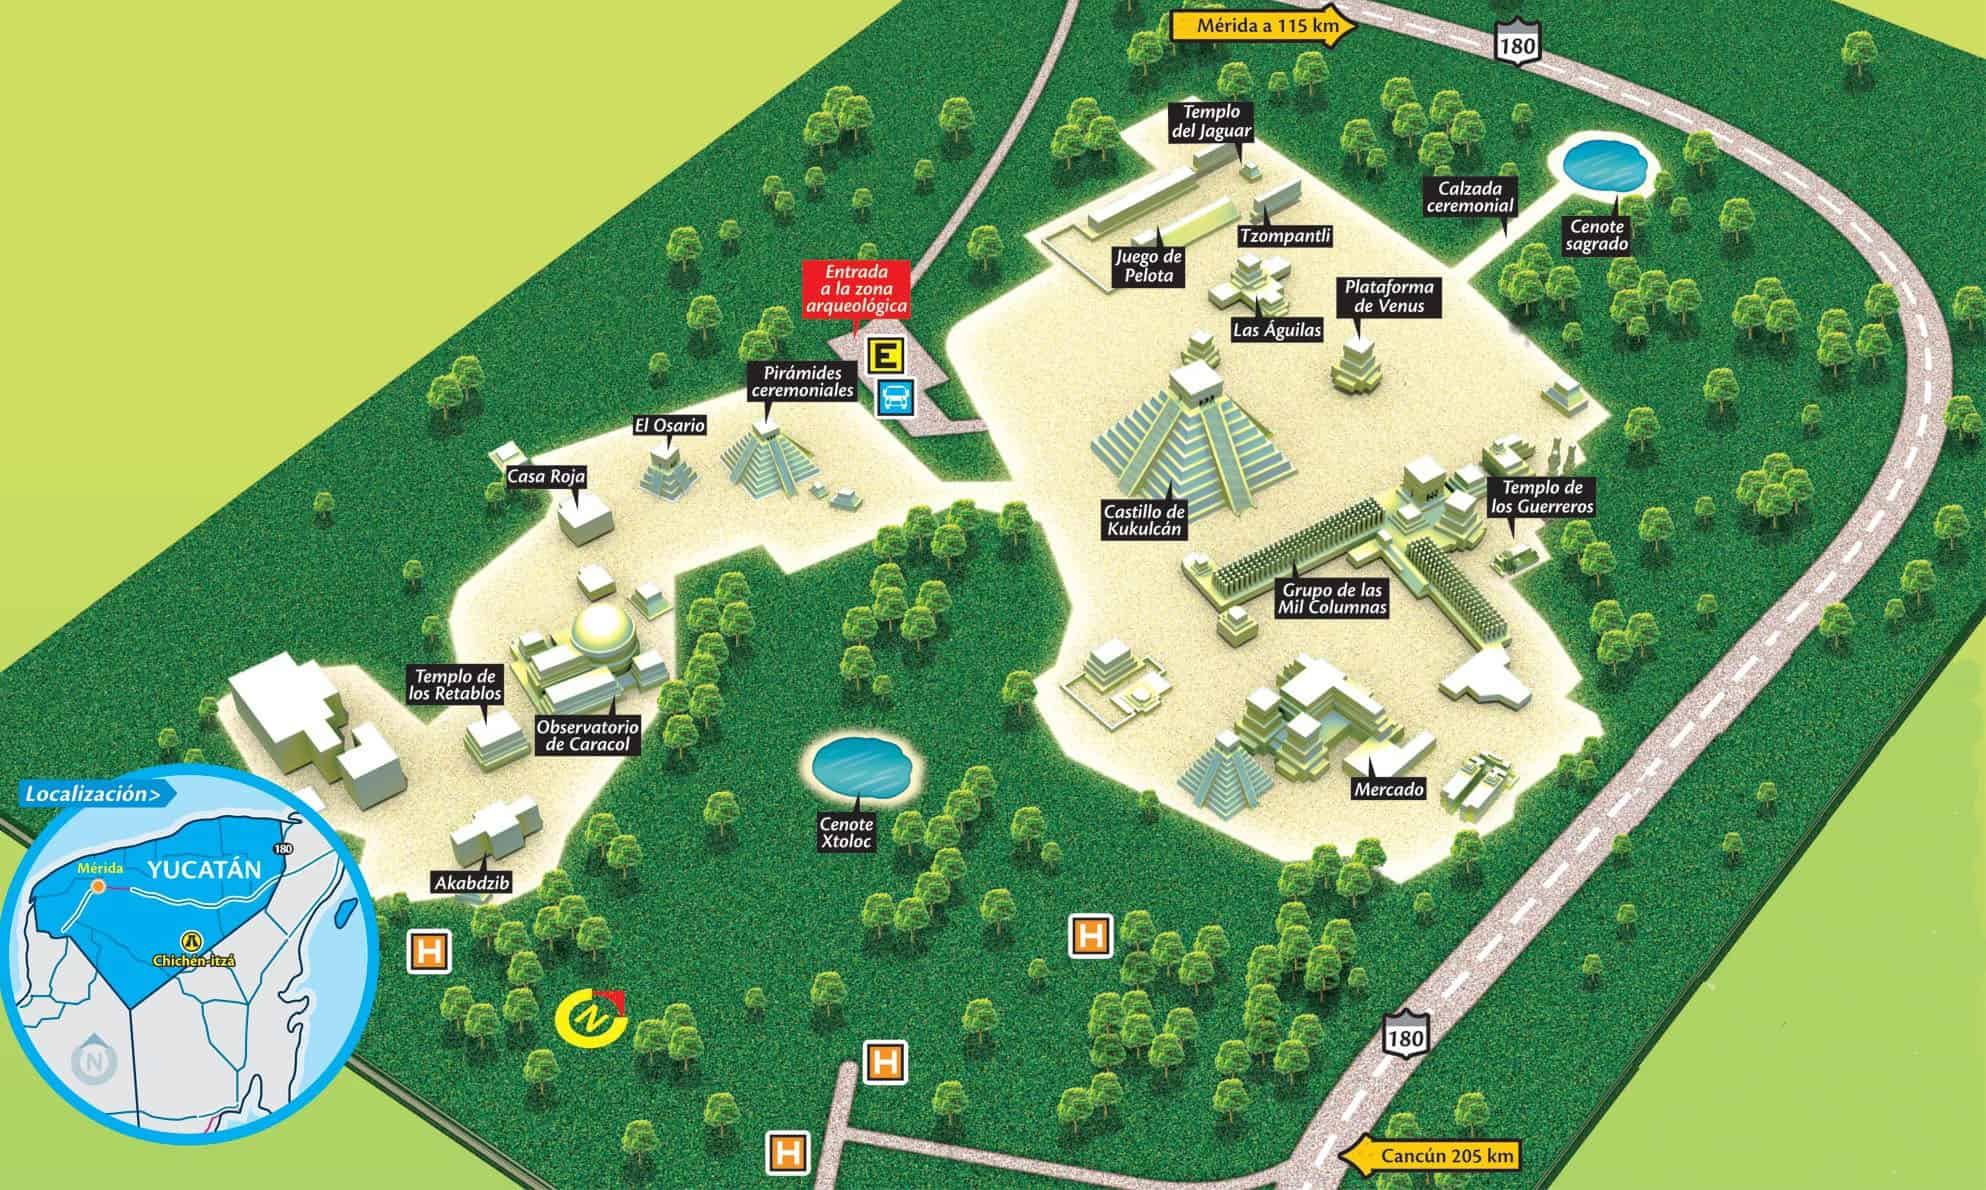 Mapa da zona arqueológica do Chichén Itzá